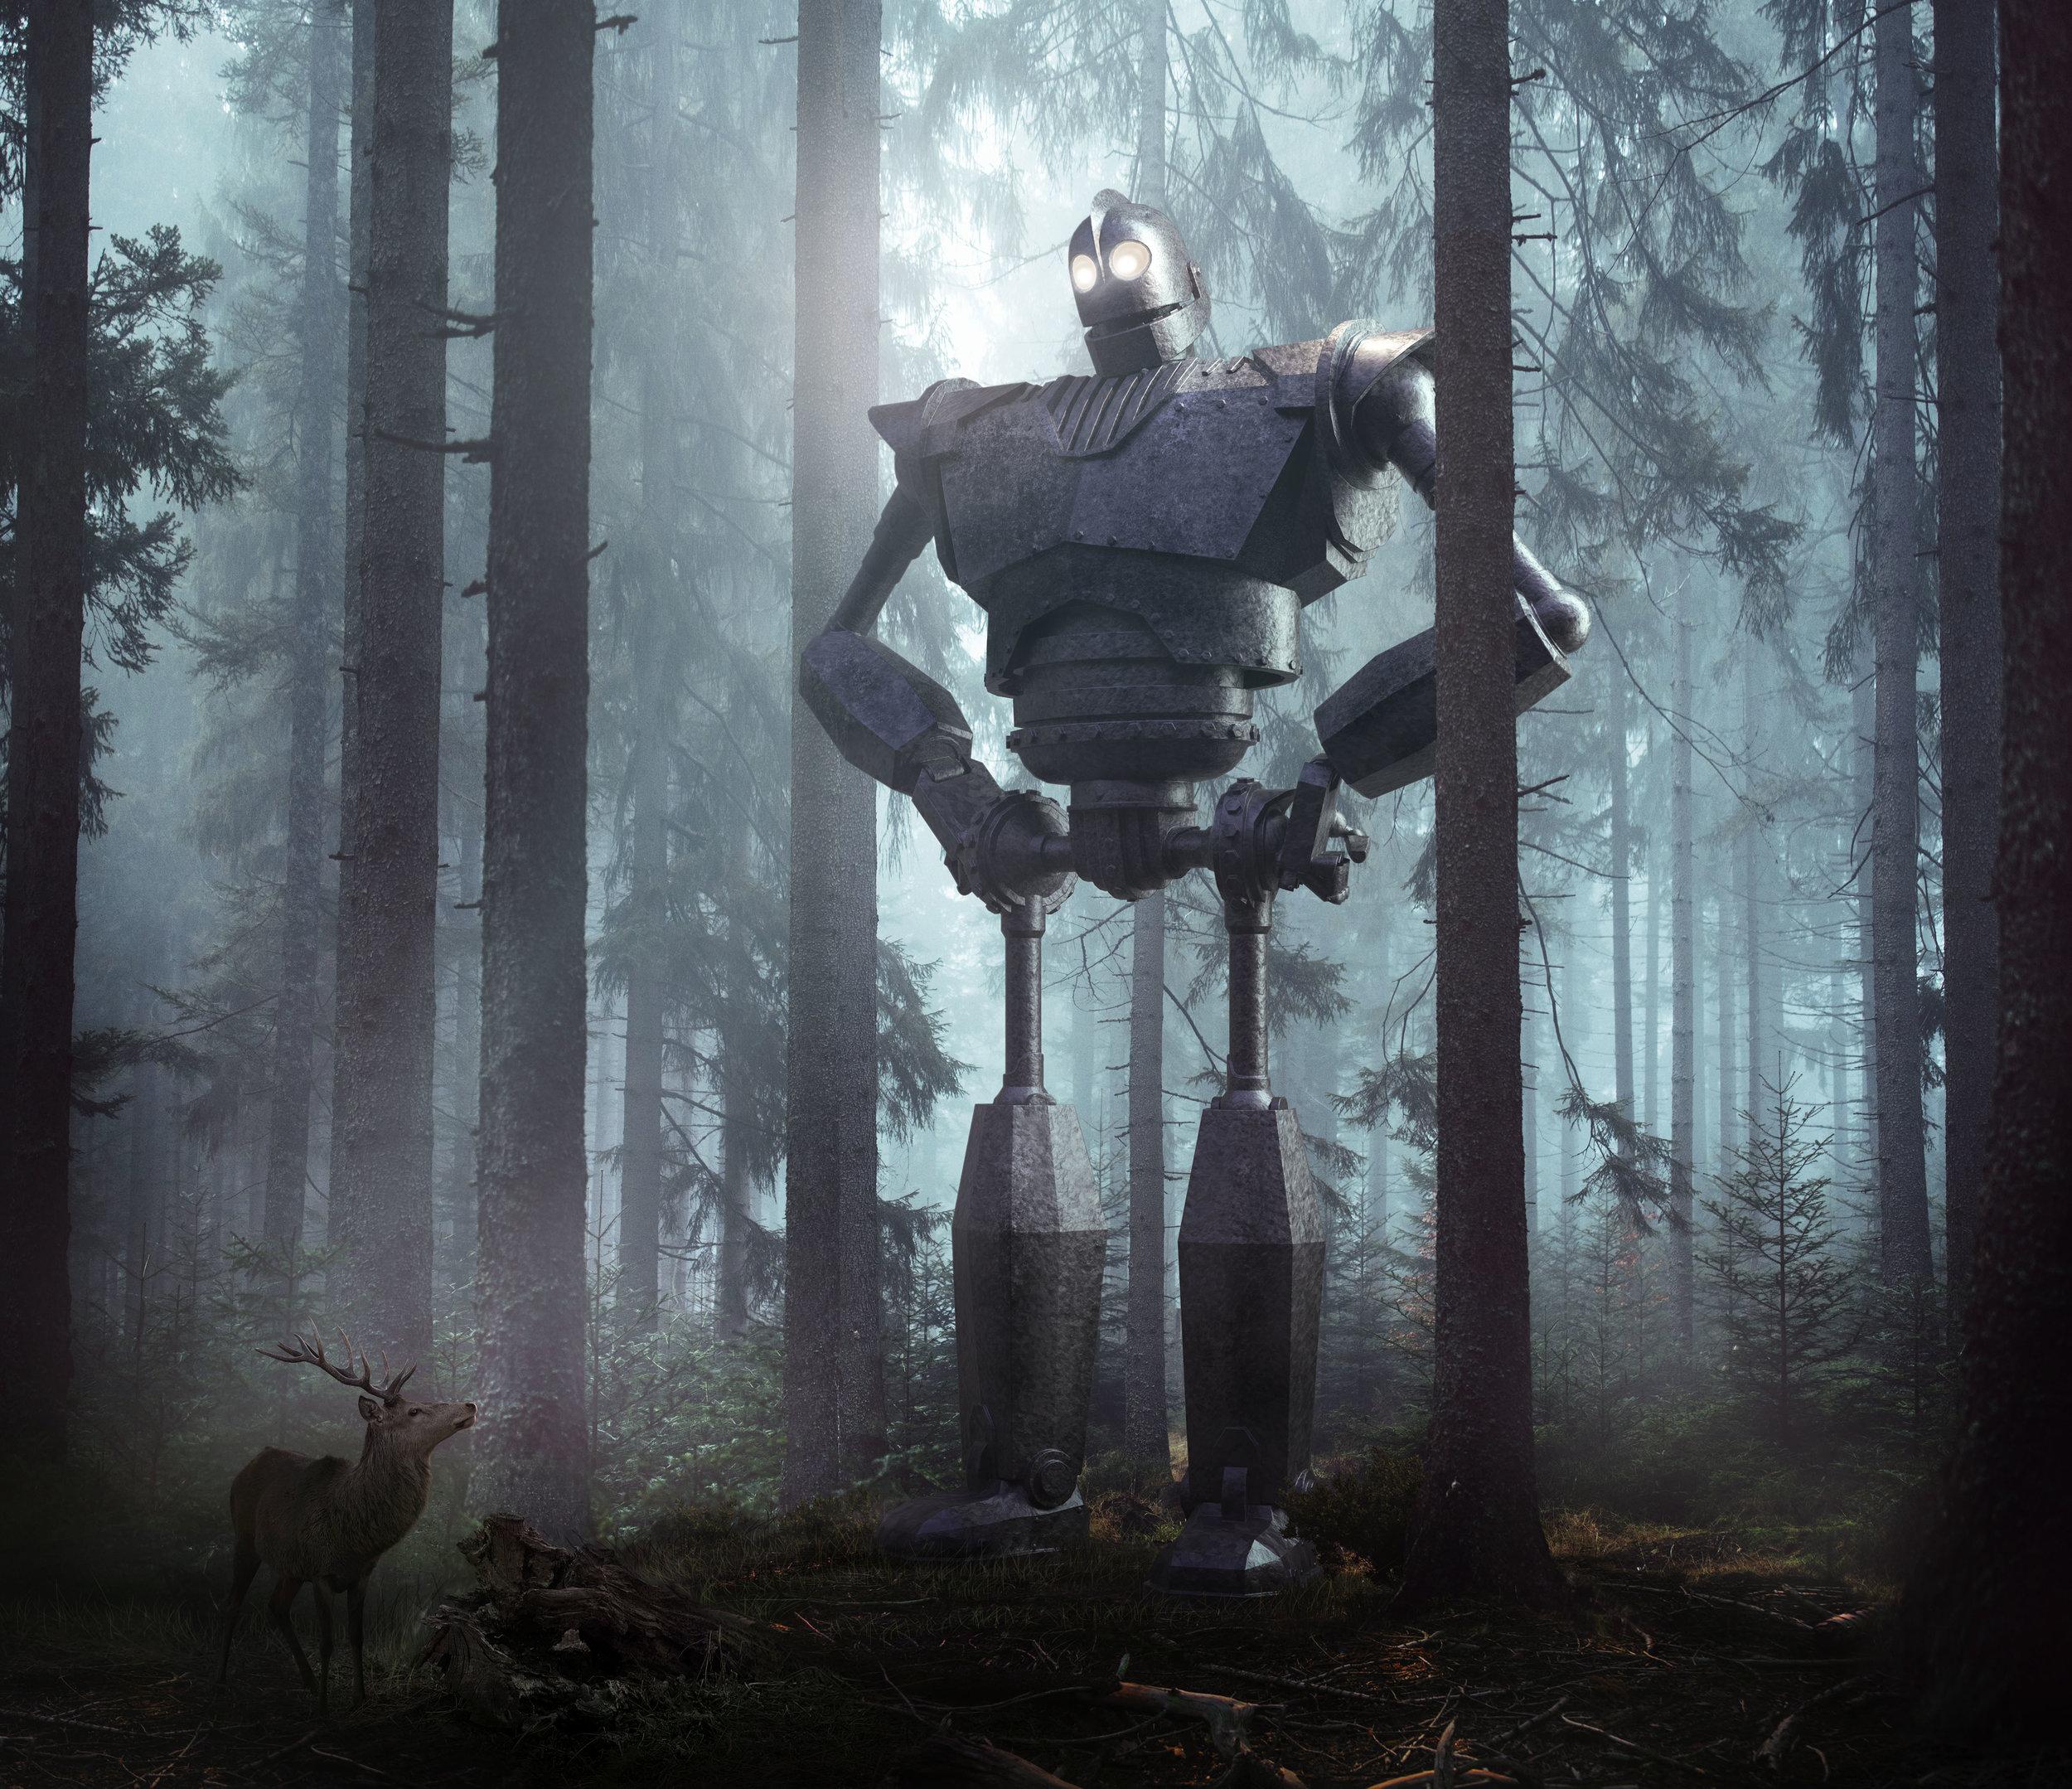 CGI and compositing • Brad Pickard